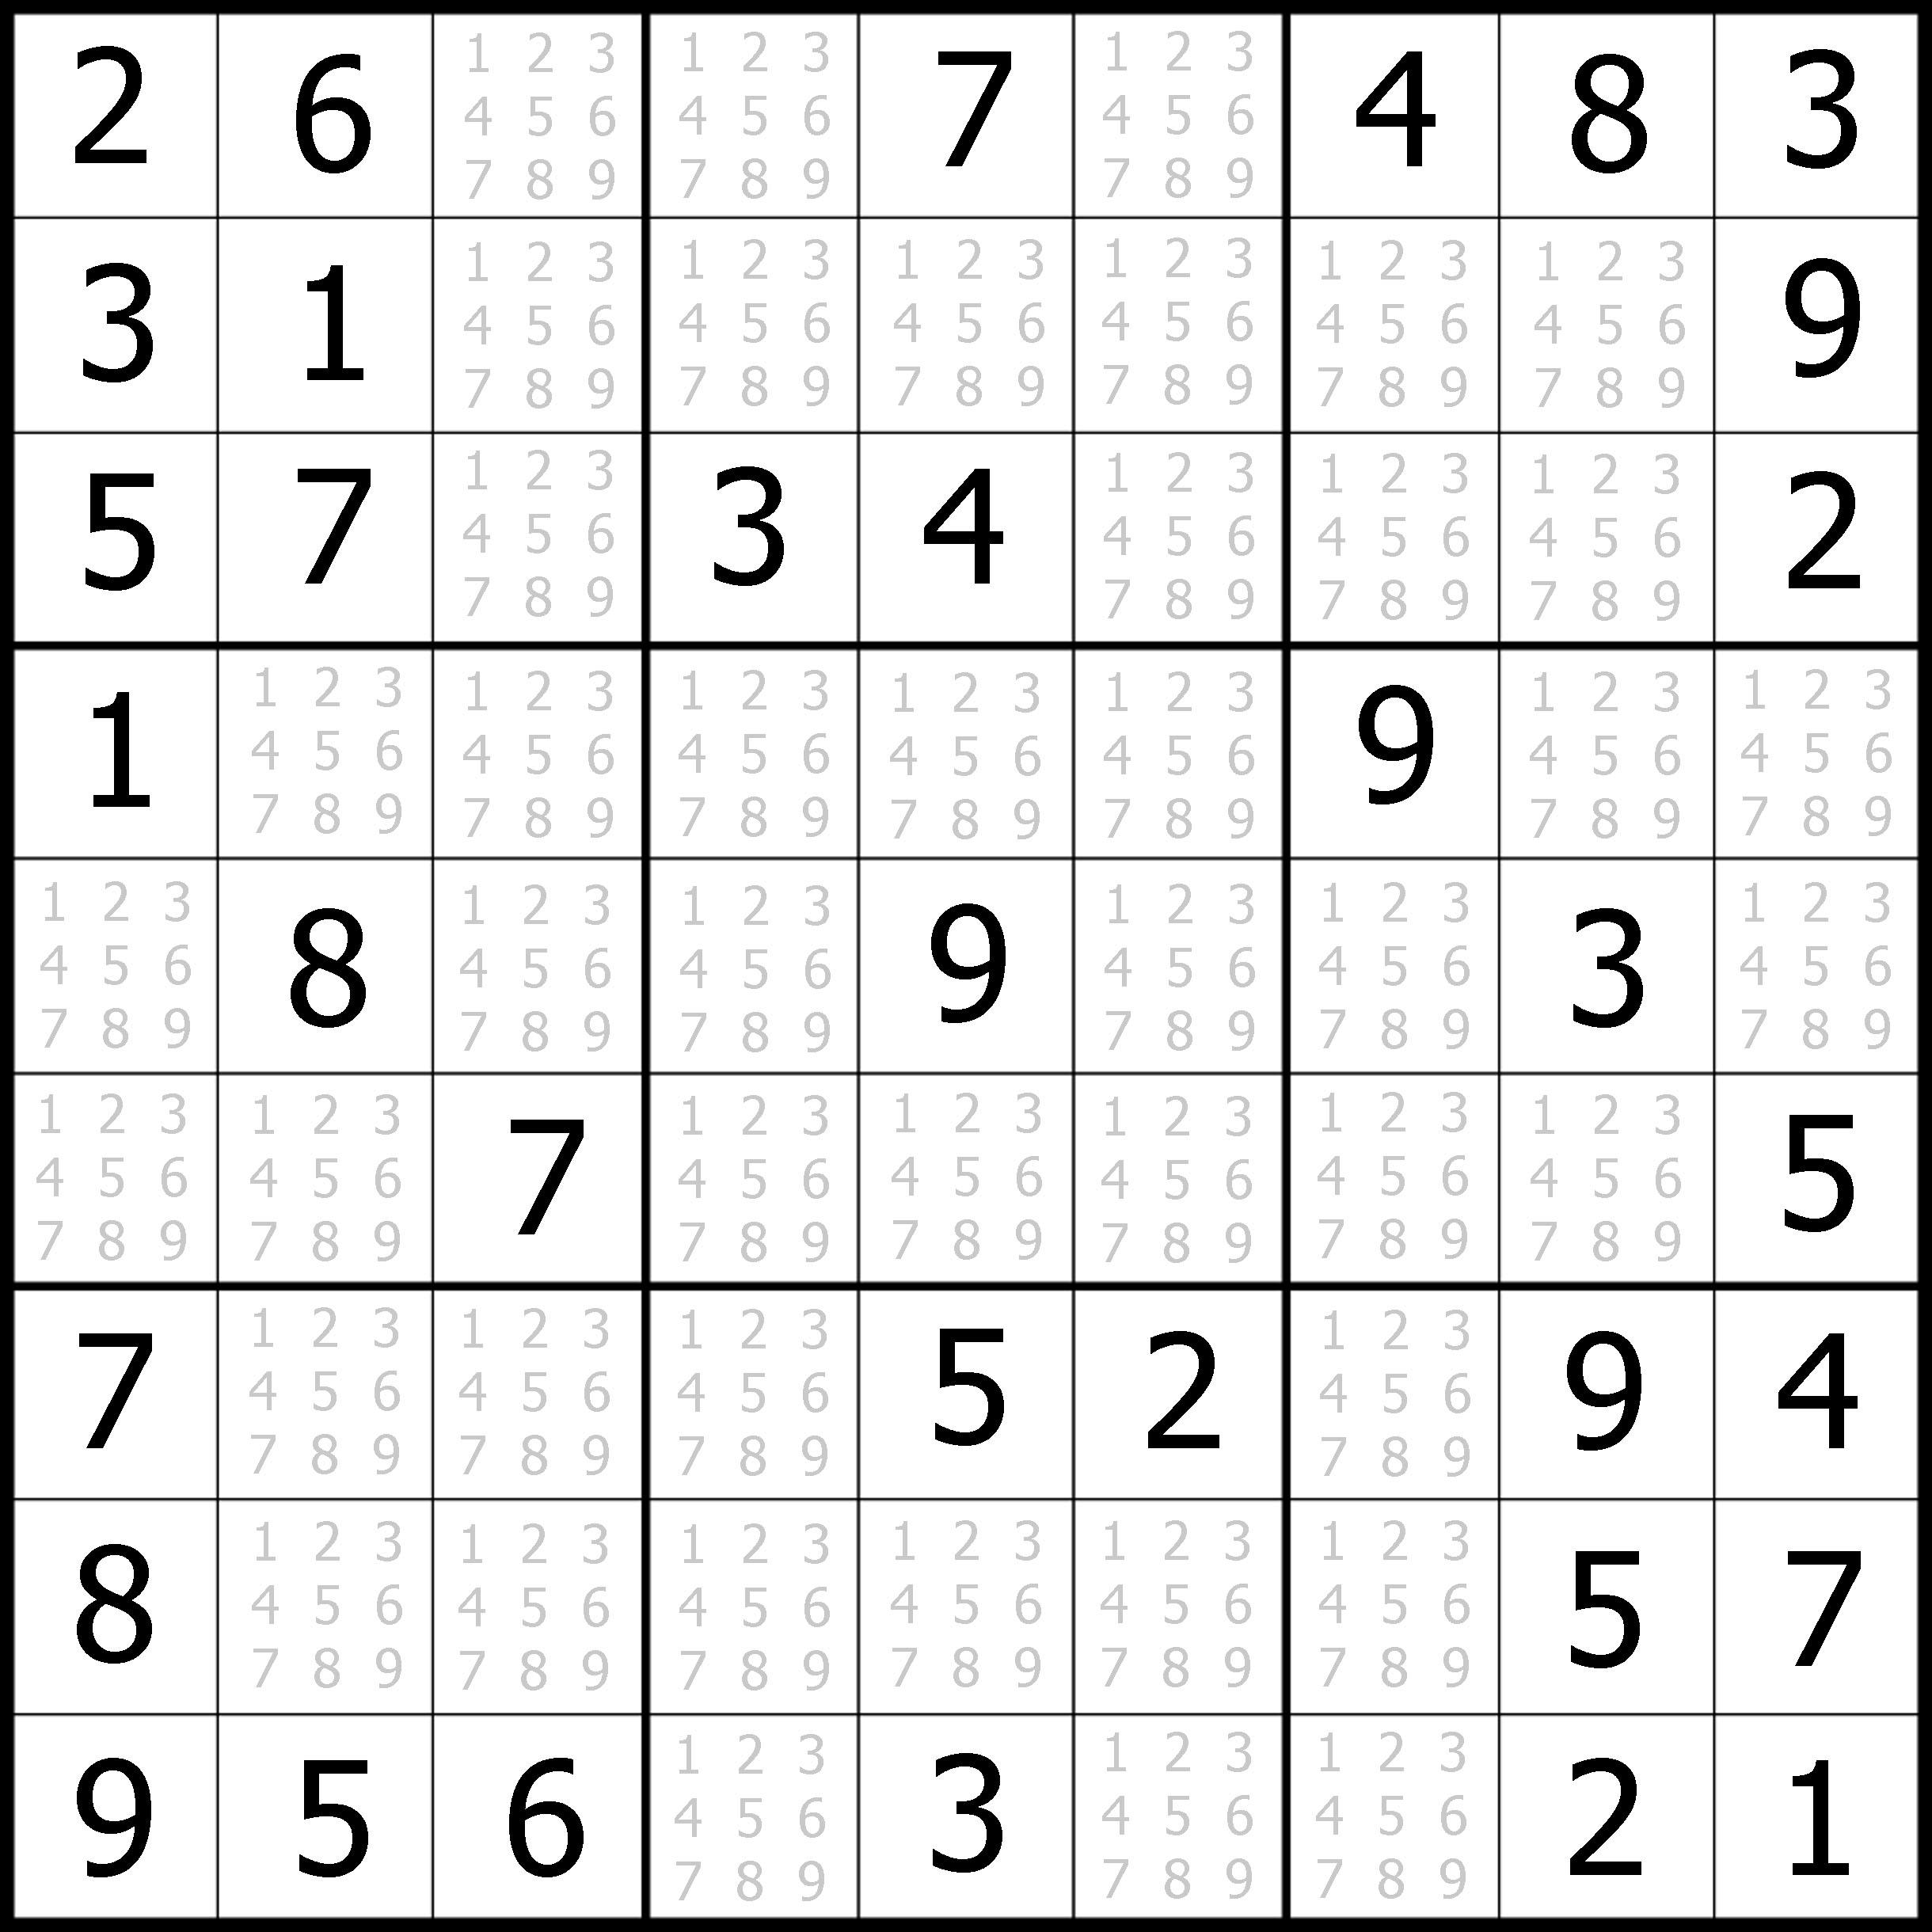 Sudoku Puzzler | Free, Printable, Updated Sudoku Puzzles With A - Printable Sudoku Puzzles Easy #6